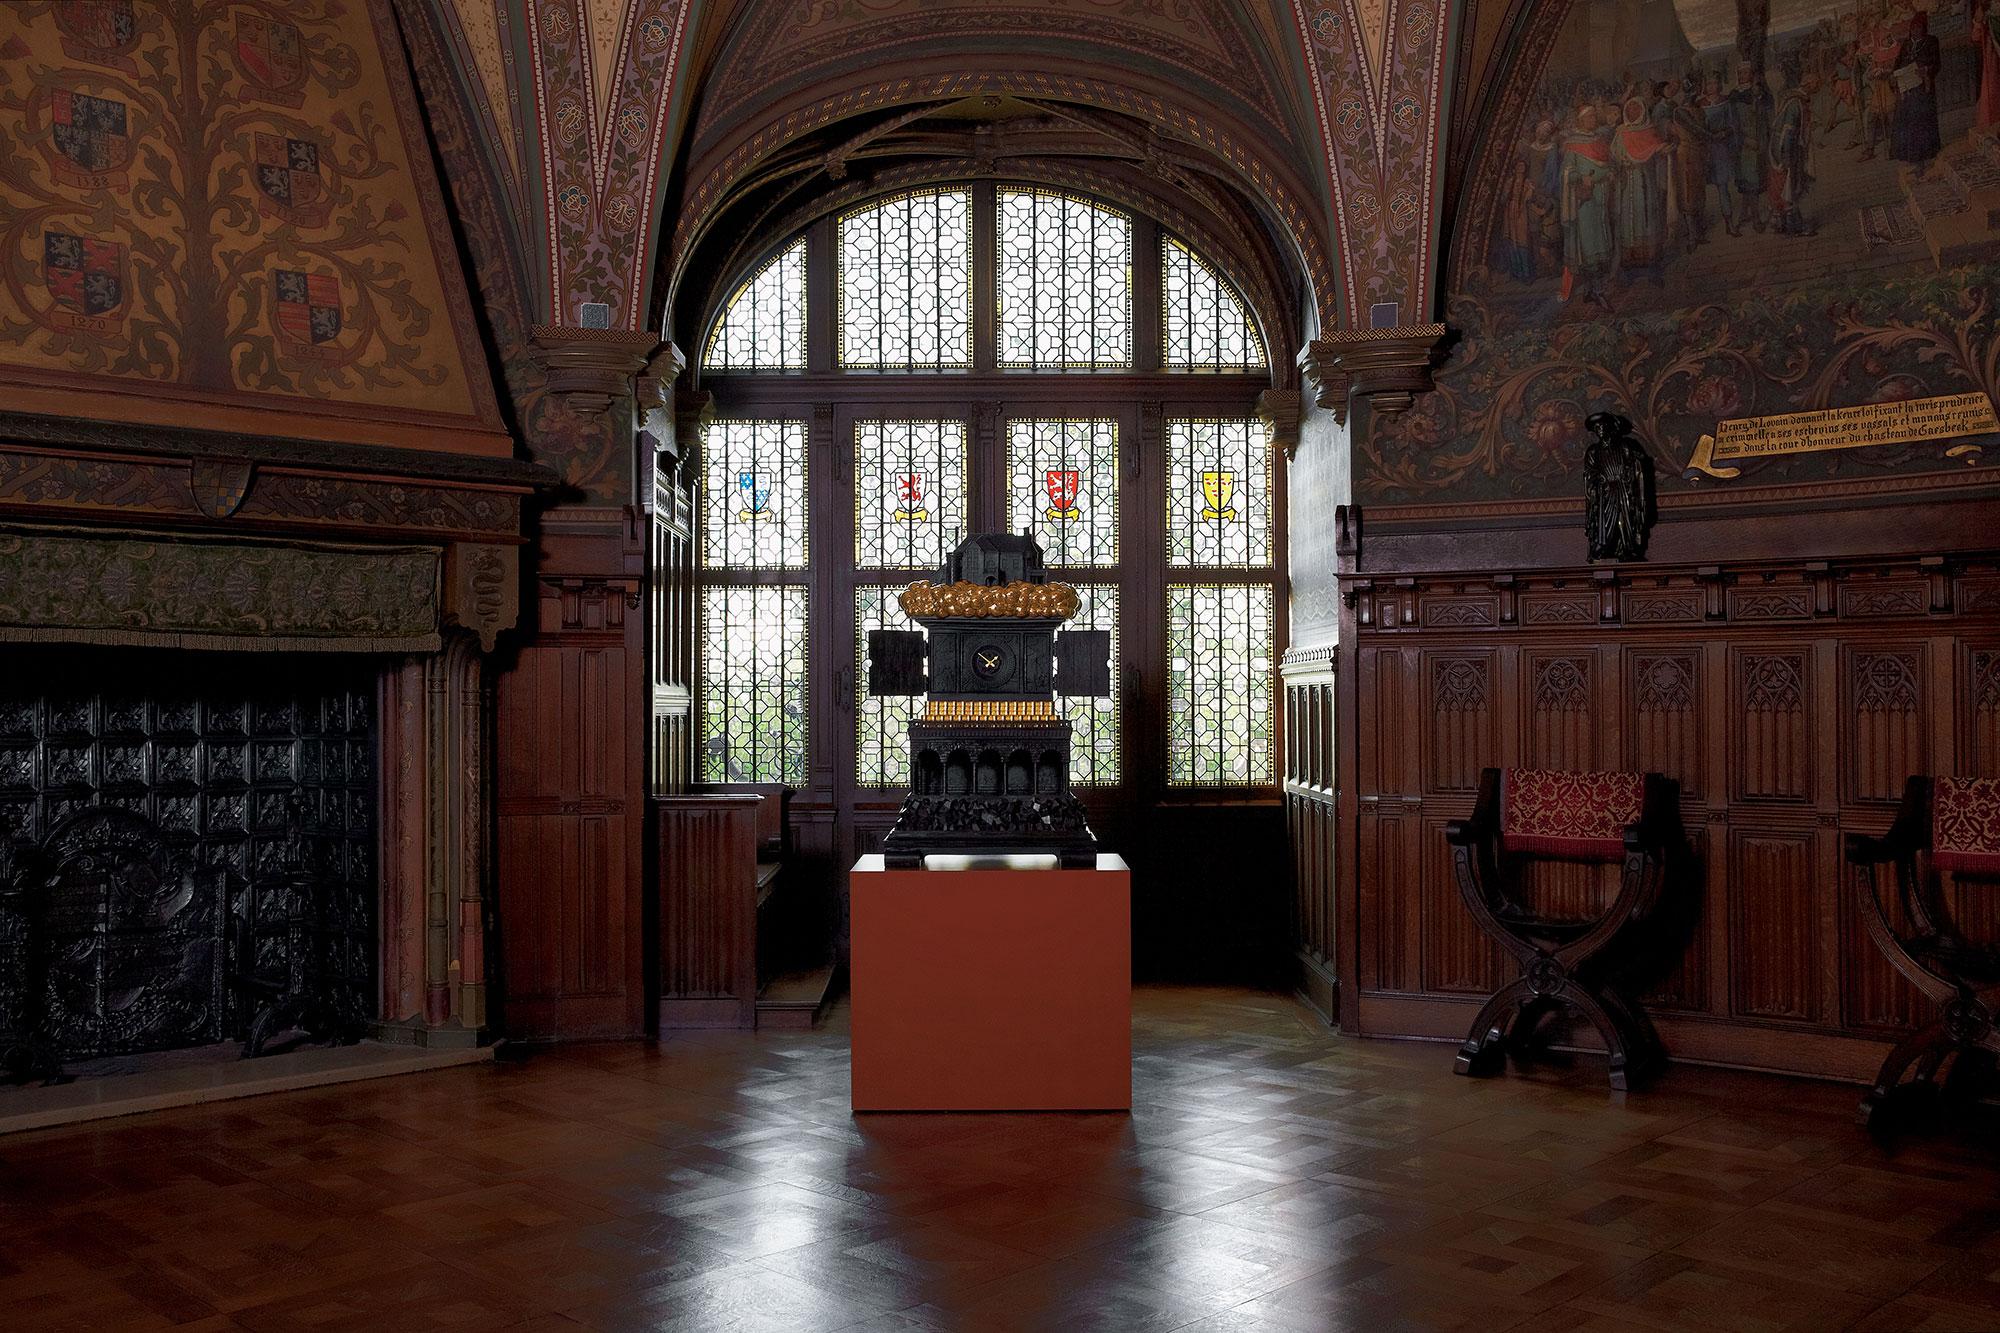 Studio-Job-Robber-Baron-Clock-Gaasbeek-Castle-Brussels